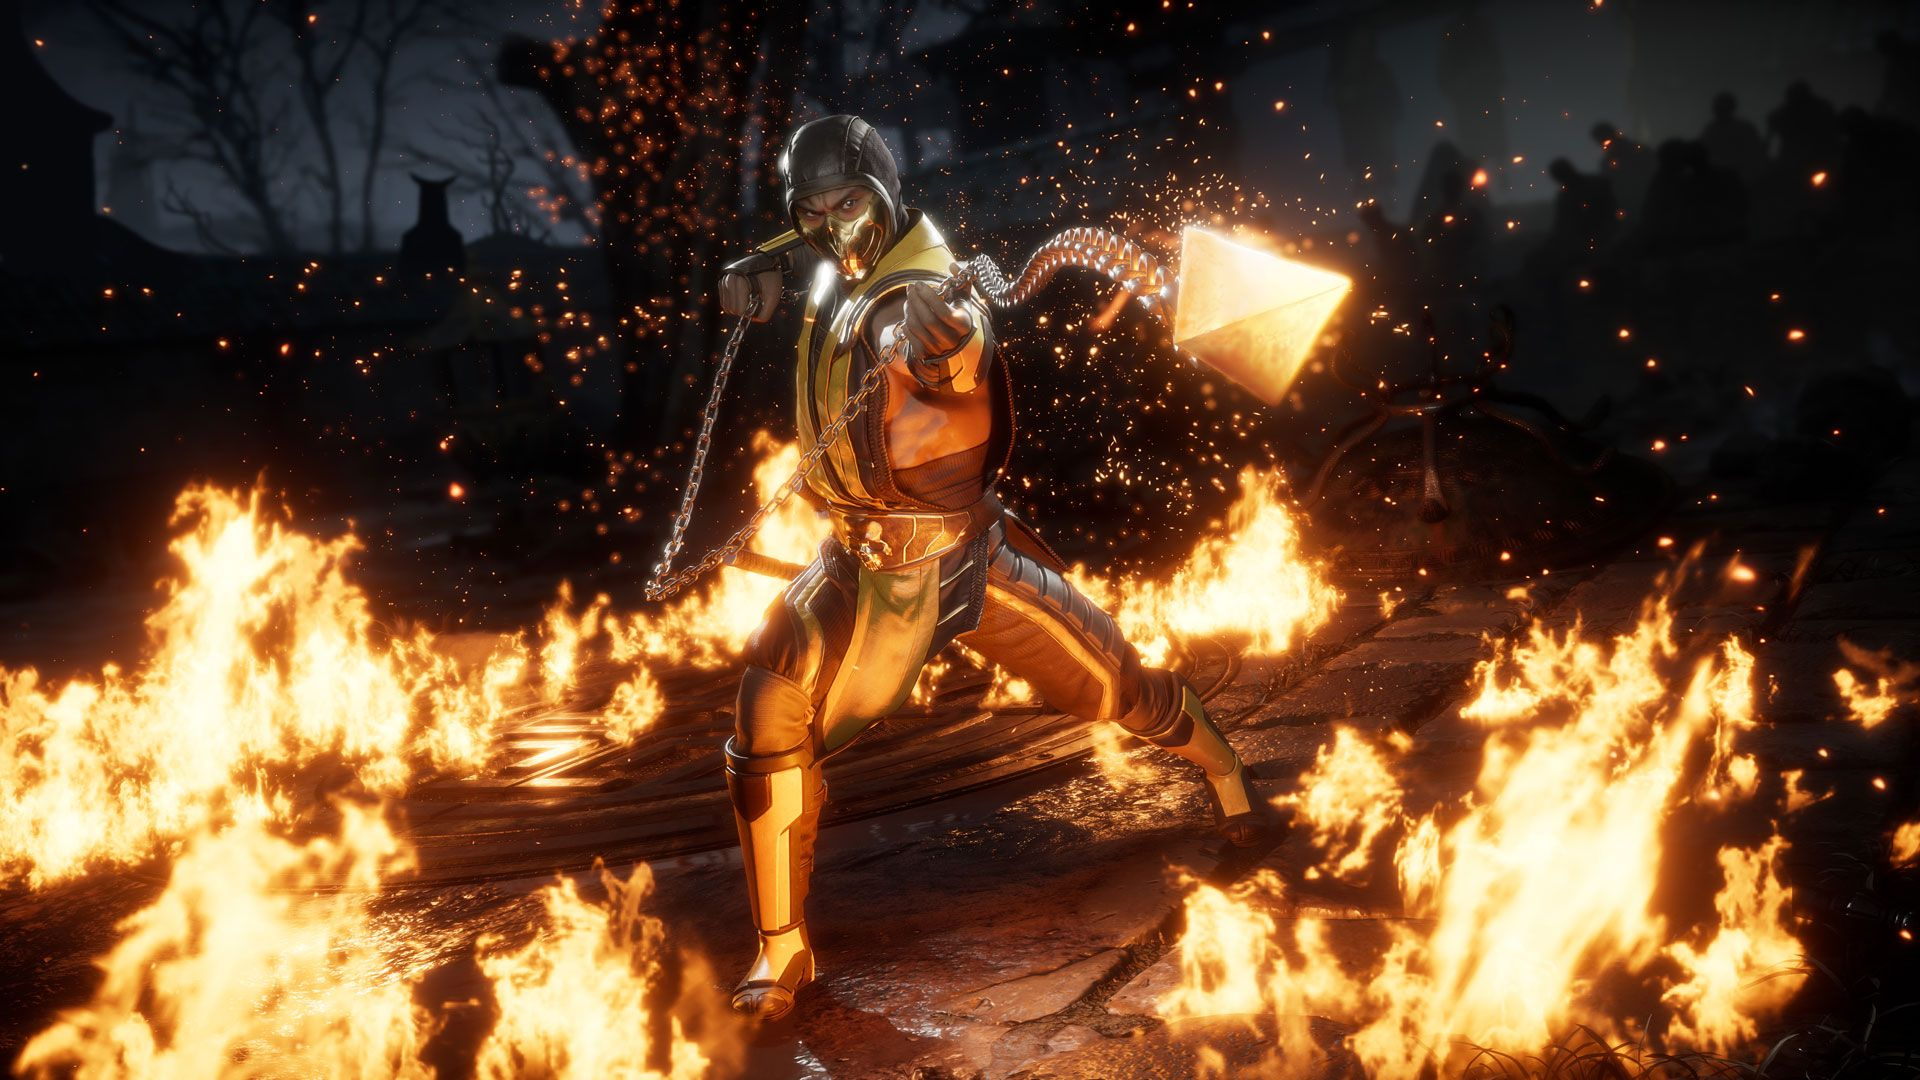 Mortal Kombat 11 Tfg Preview Mortal Kombat Mortal Kombat